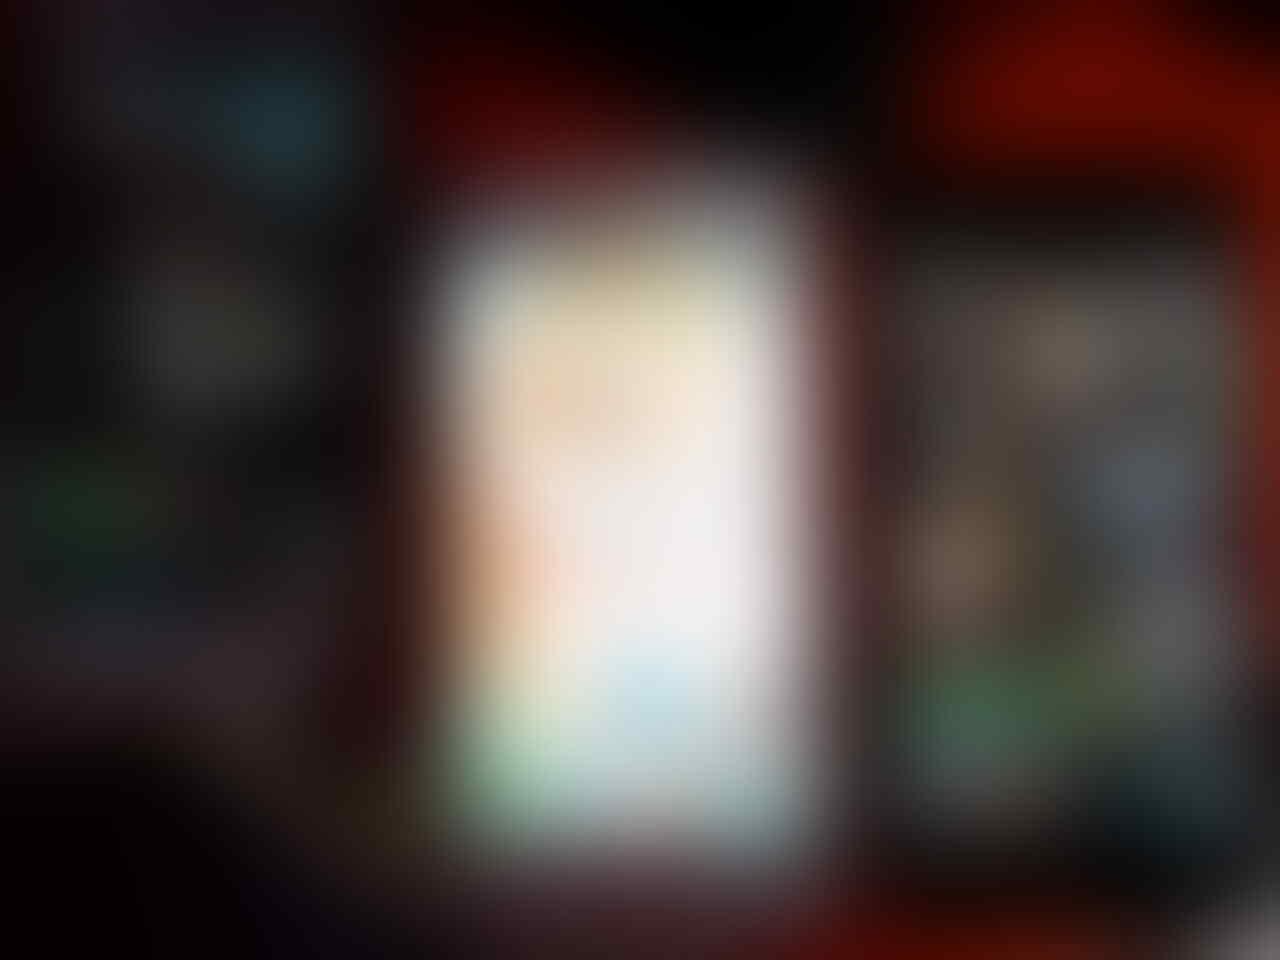 [ OFFICIAL LOUNGE ] Lenovo A6000 | Affordable 4G LTE - Snapdragon 64 bit